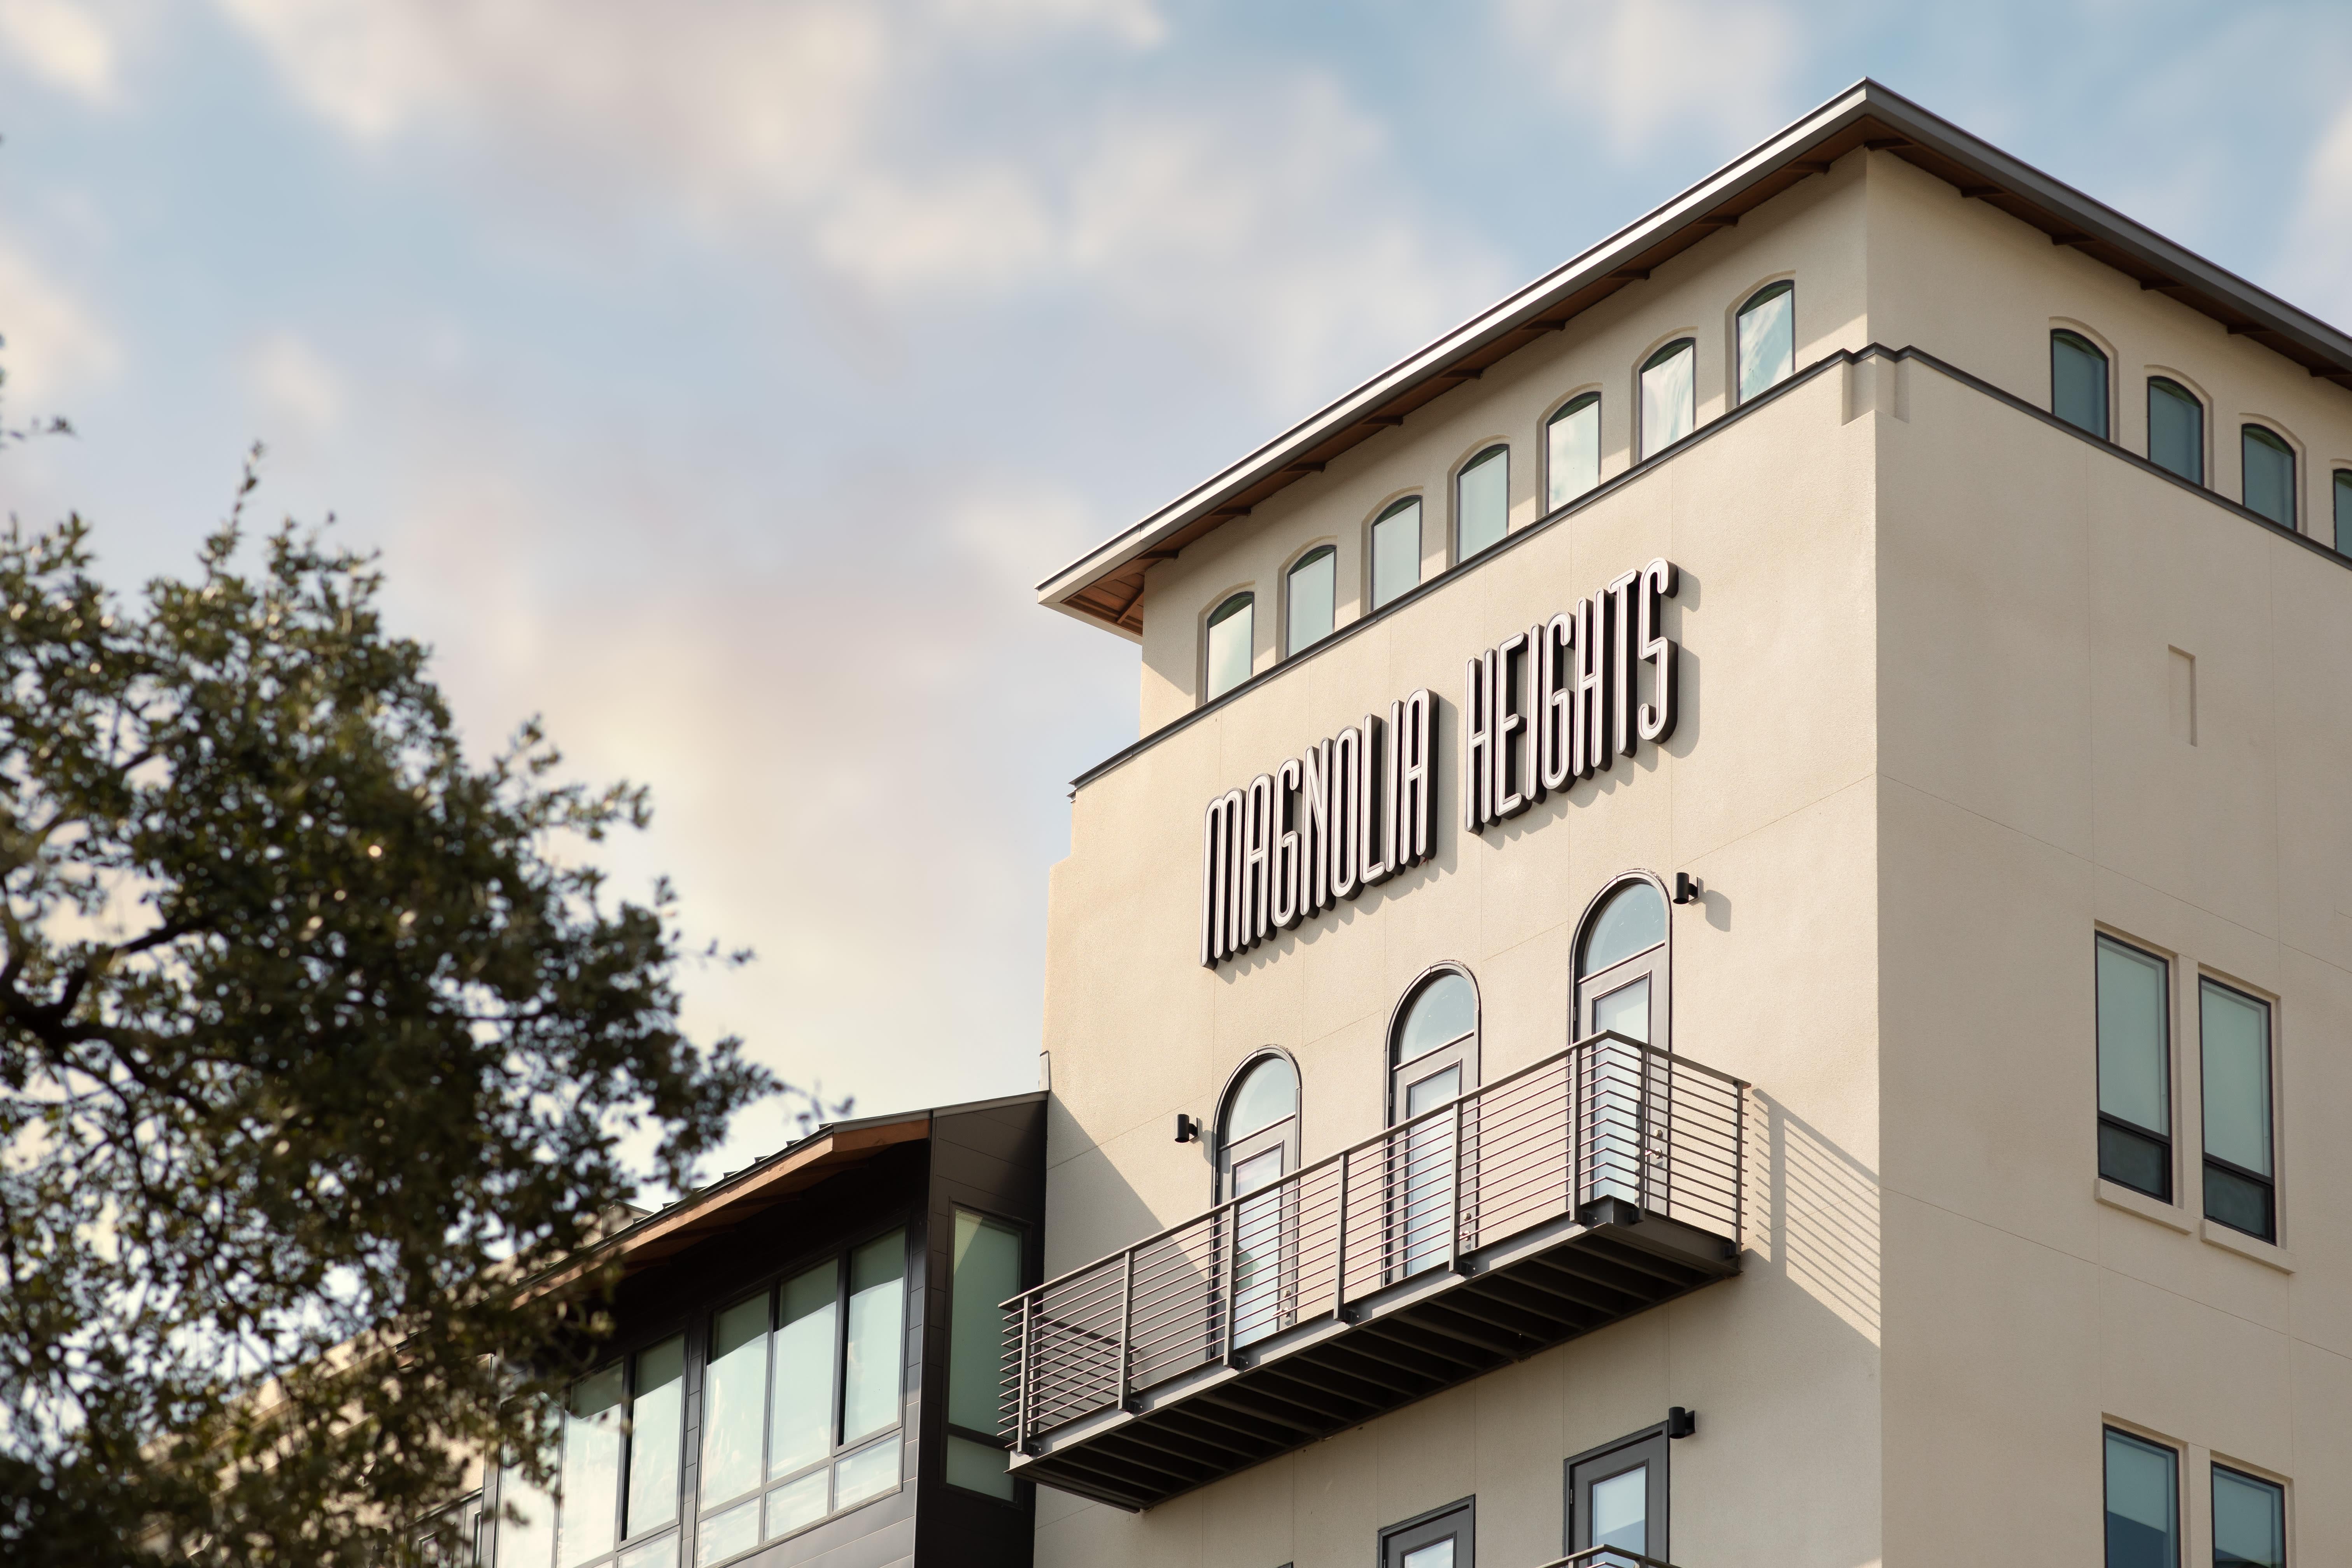 Sign on building of Magnolia Heights in San Antonio, Texas